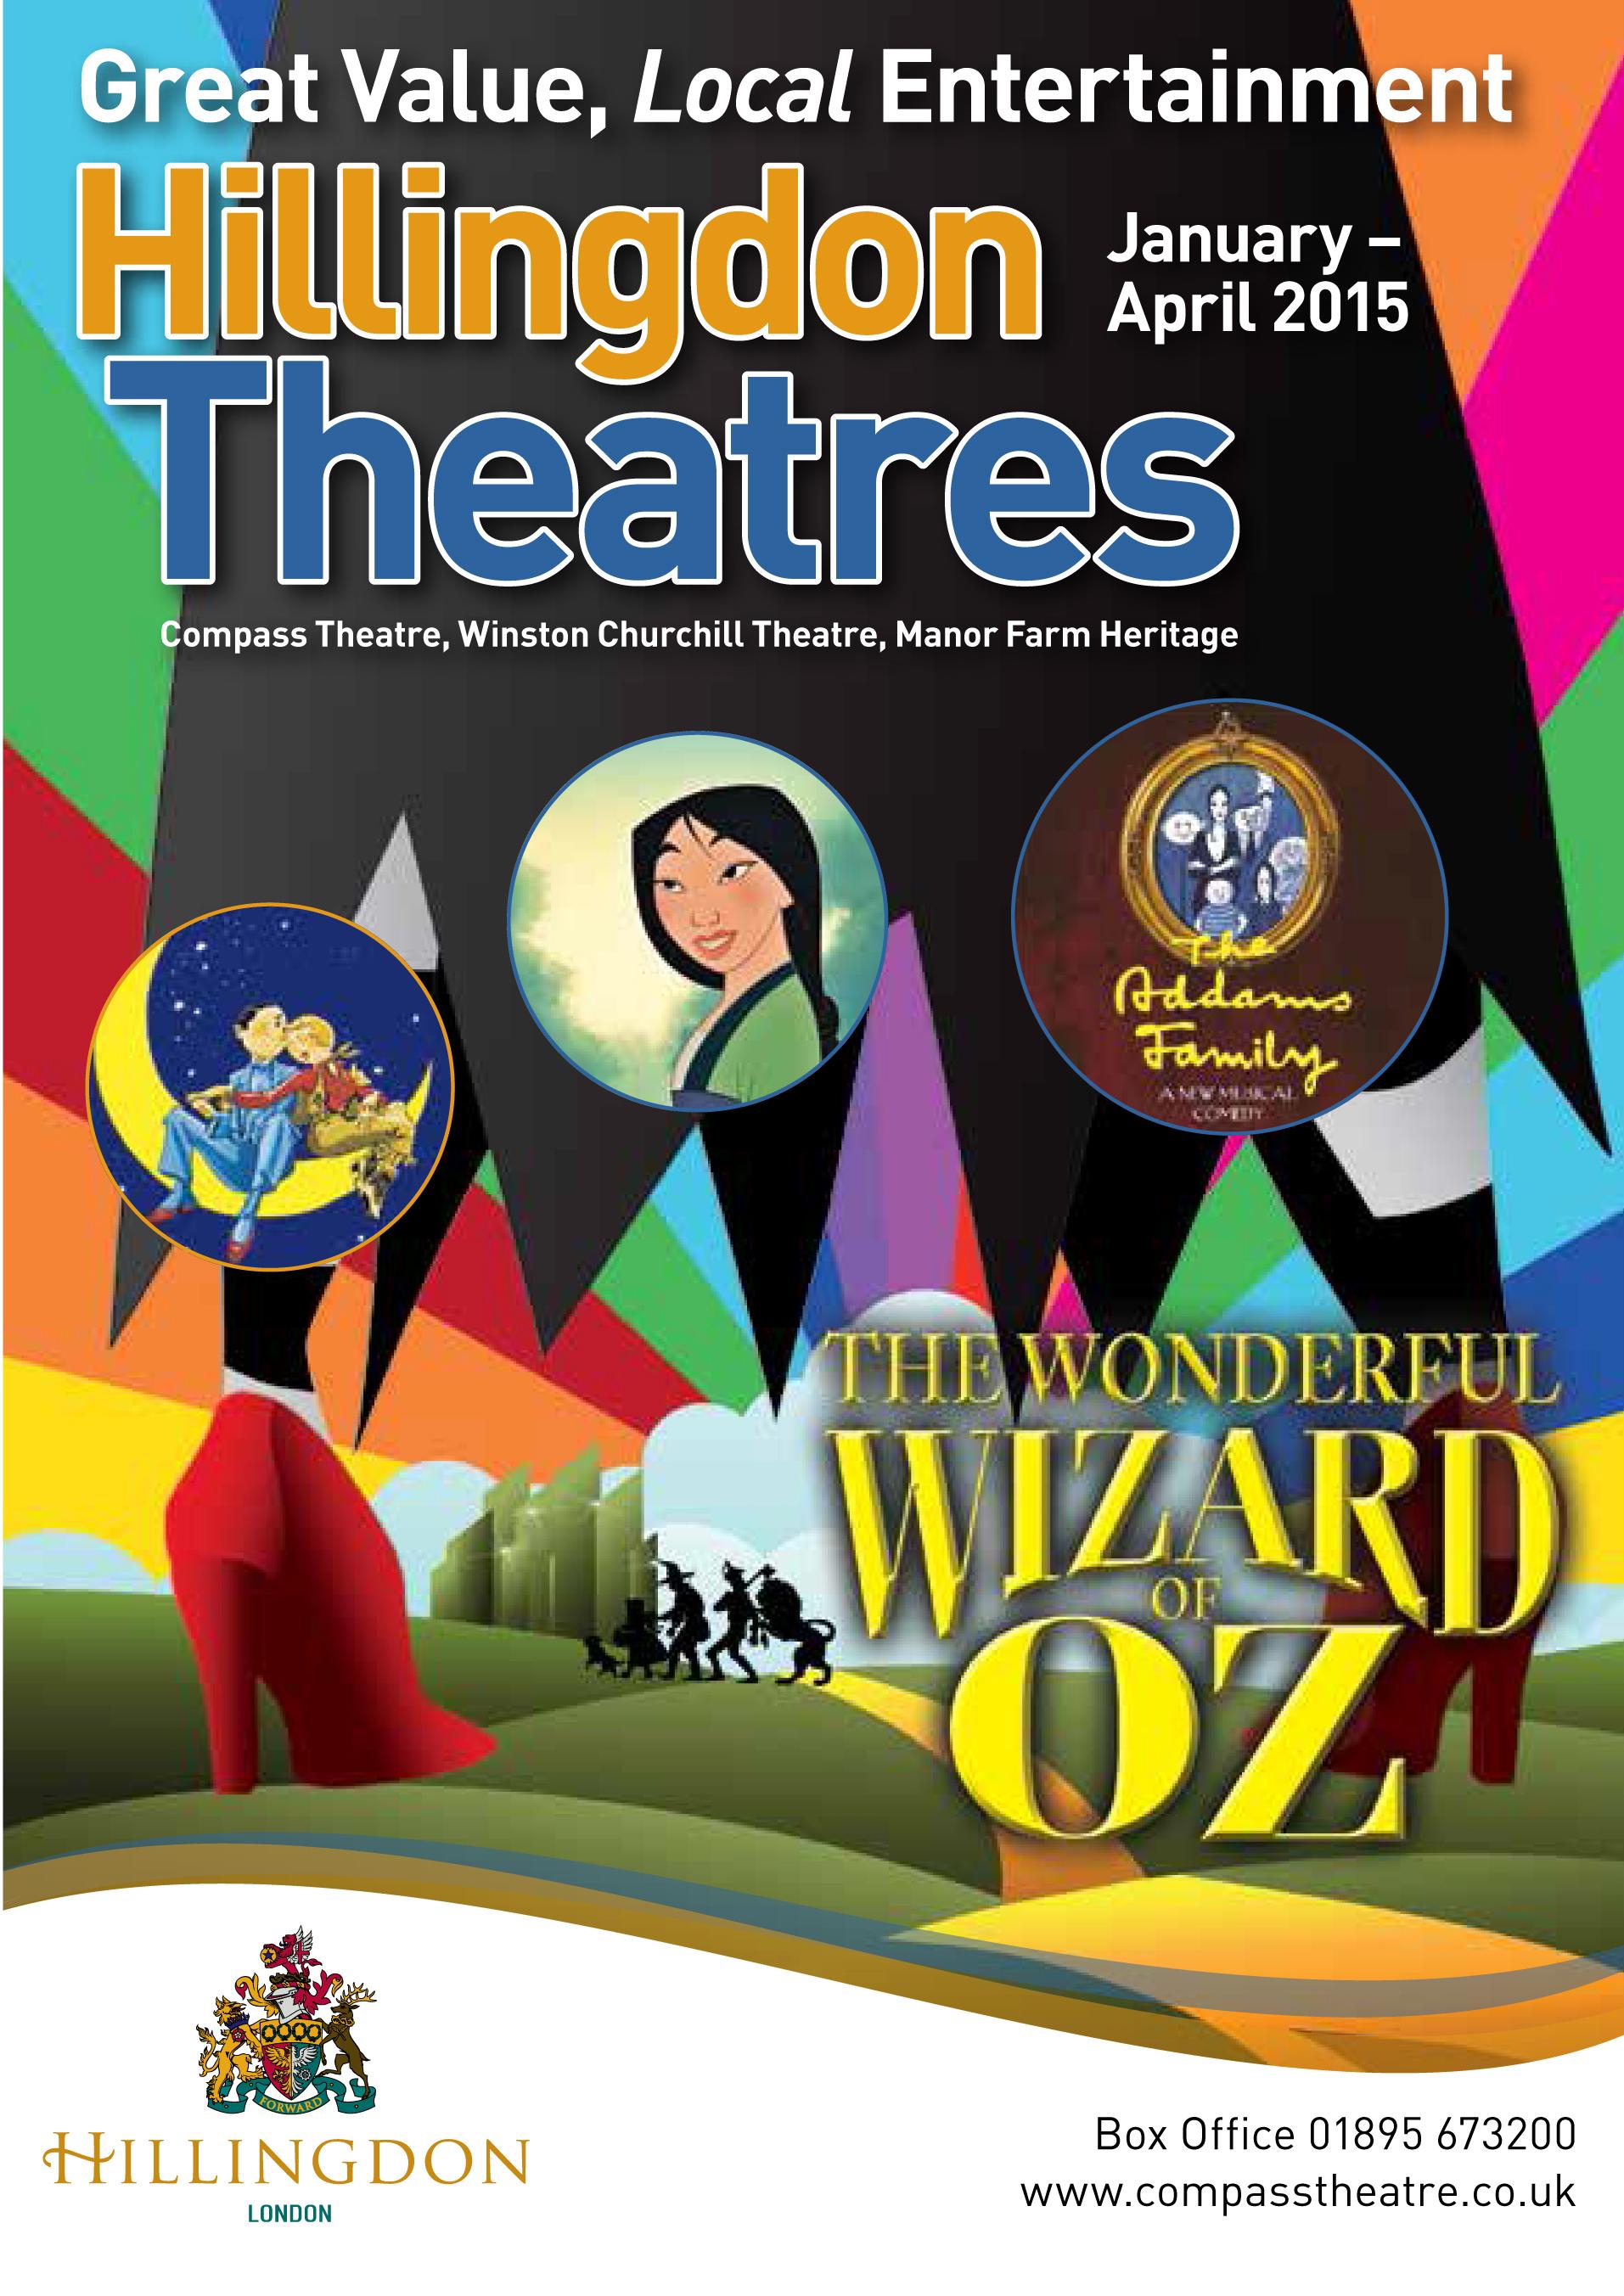 HillingdonTheatres Season Brochure 2015 Jan to Apr Cover